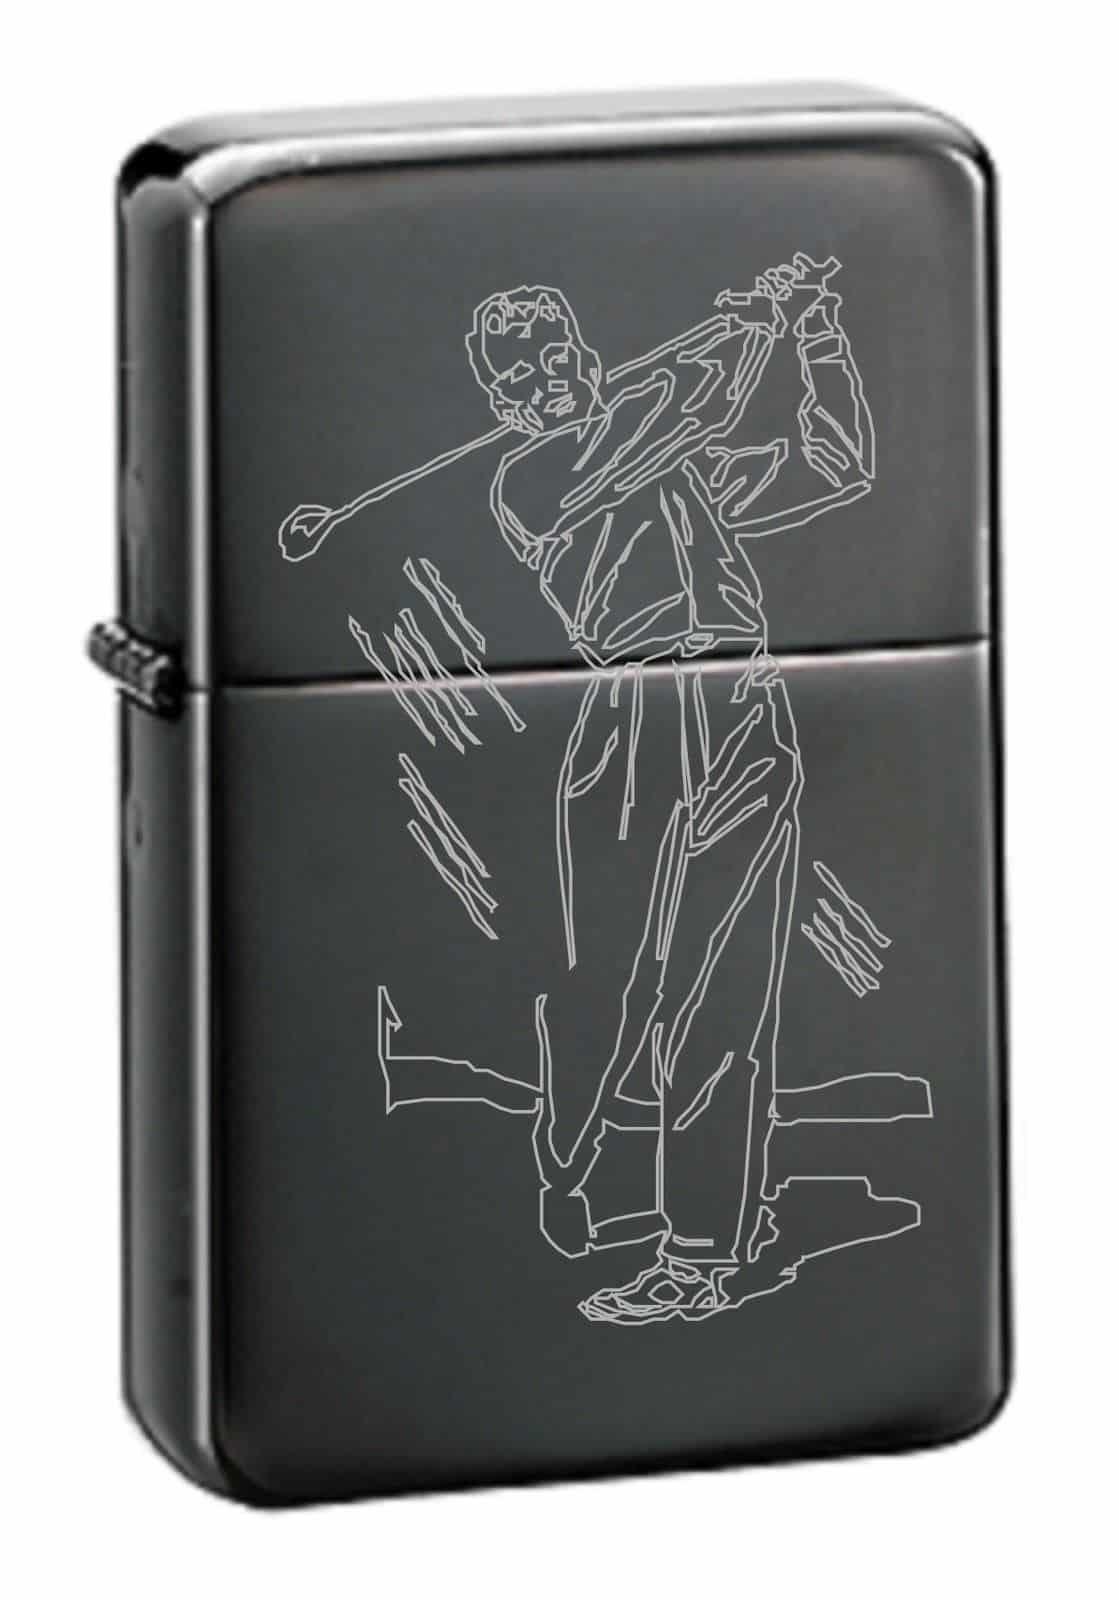 golfer-black-ice